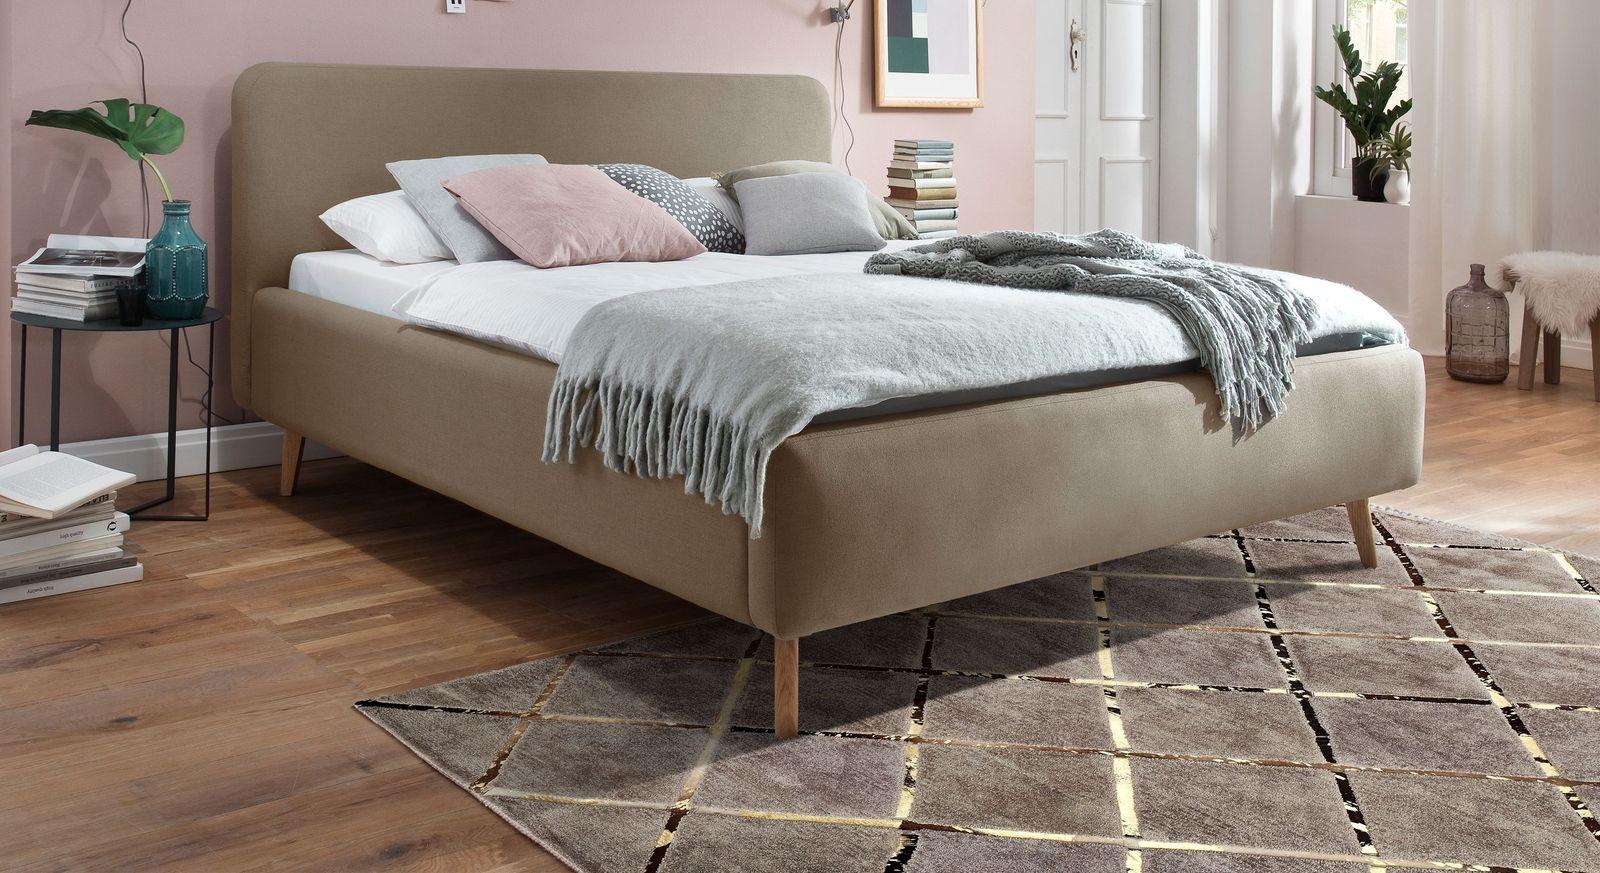 Bett Carballo aus taupefarbenem Webstoff